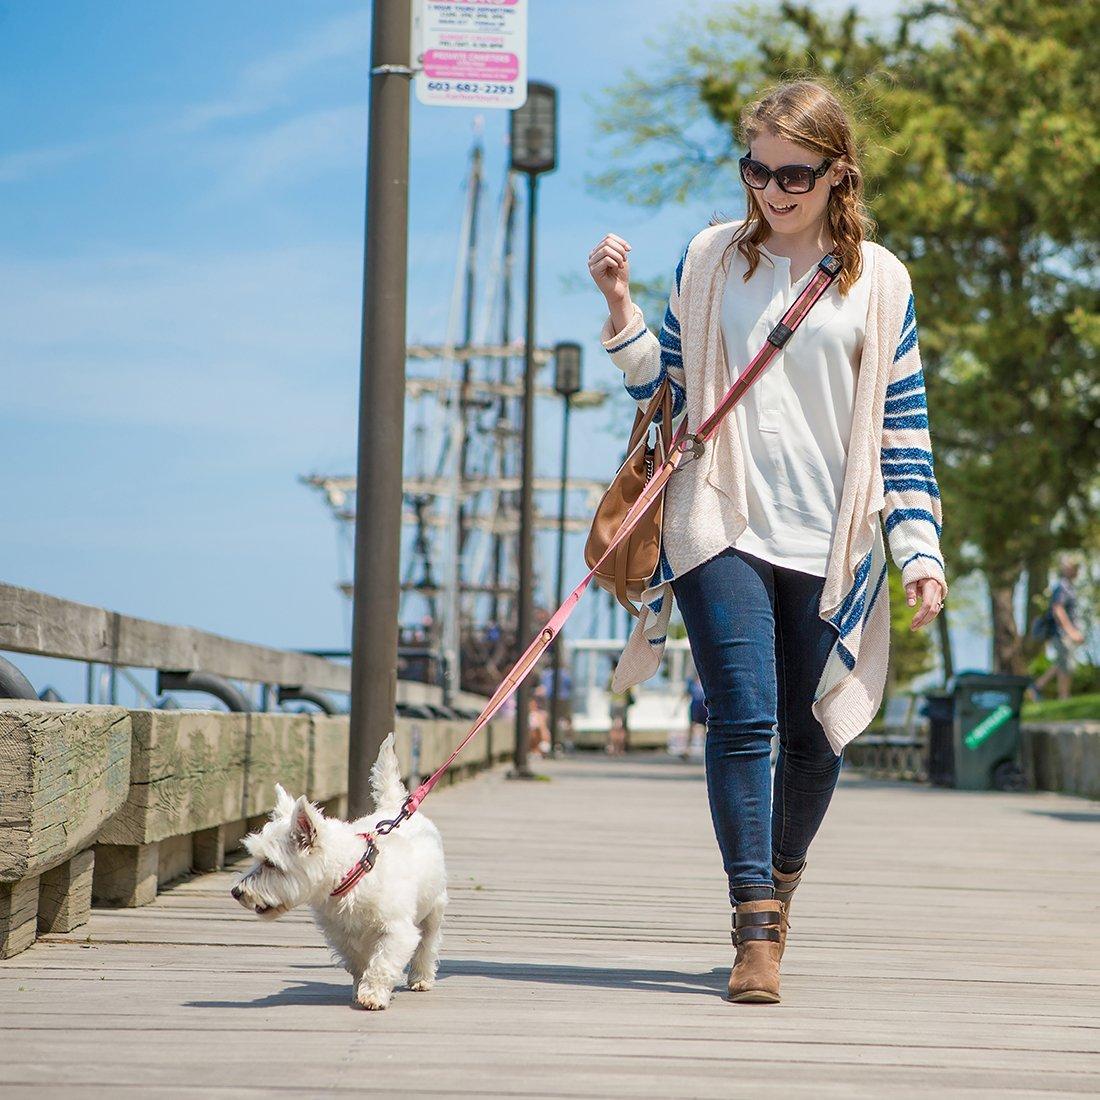 hiking-dog-leash